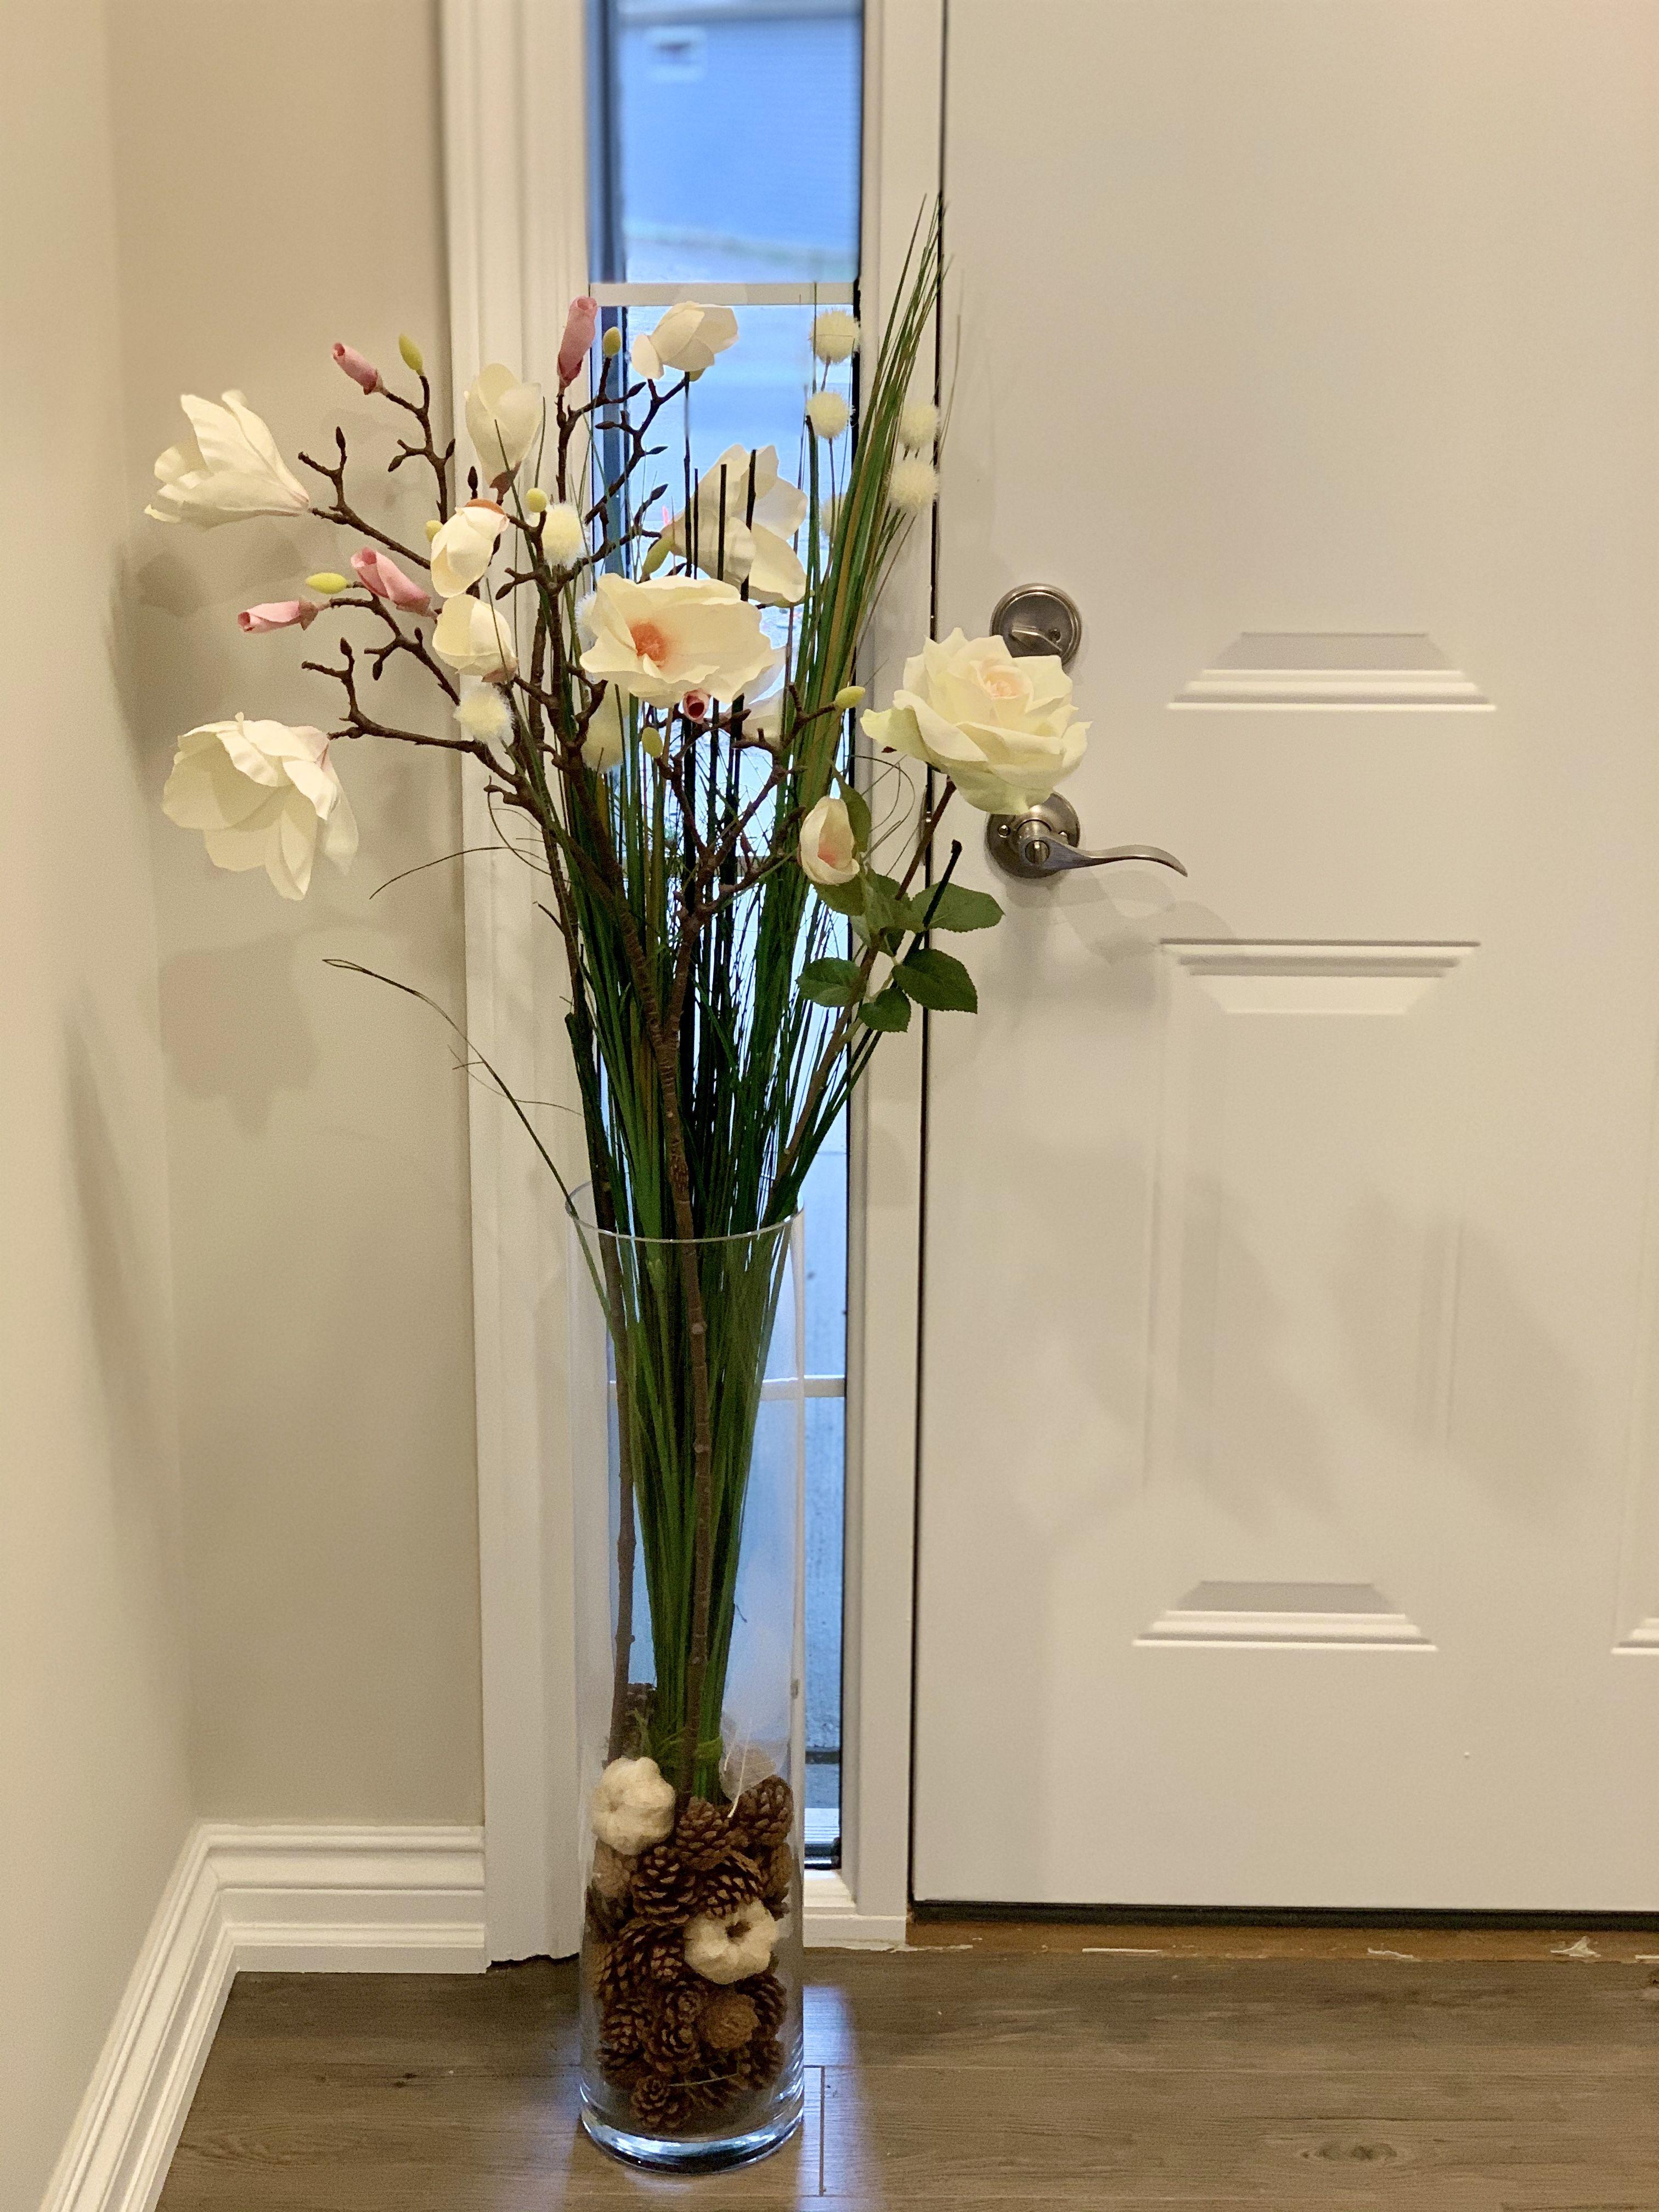 Livingroomdecor Tall Vase With Large Stem Flowers Creativedecor For Hallway Tall Vase Decor Floor Vase Decor Glass Vase Decor